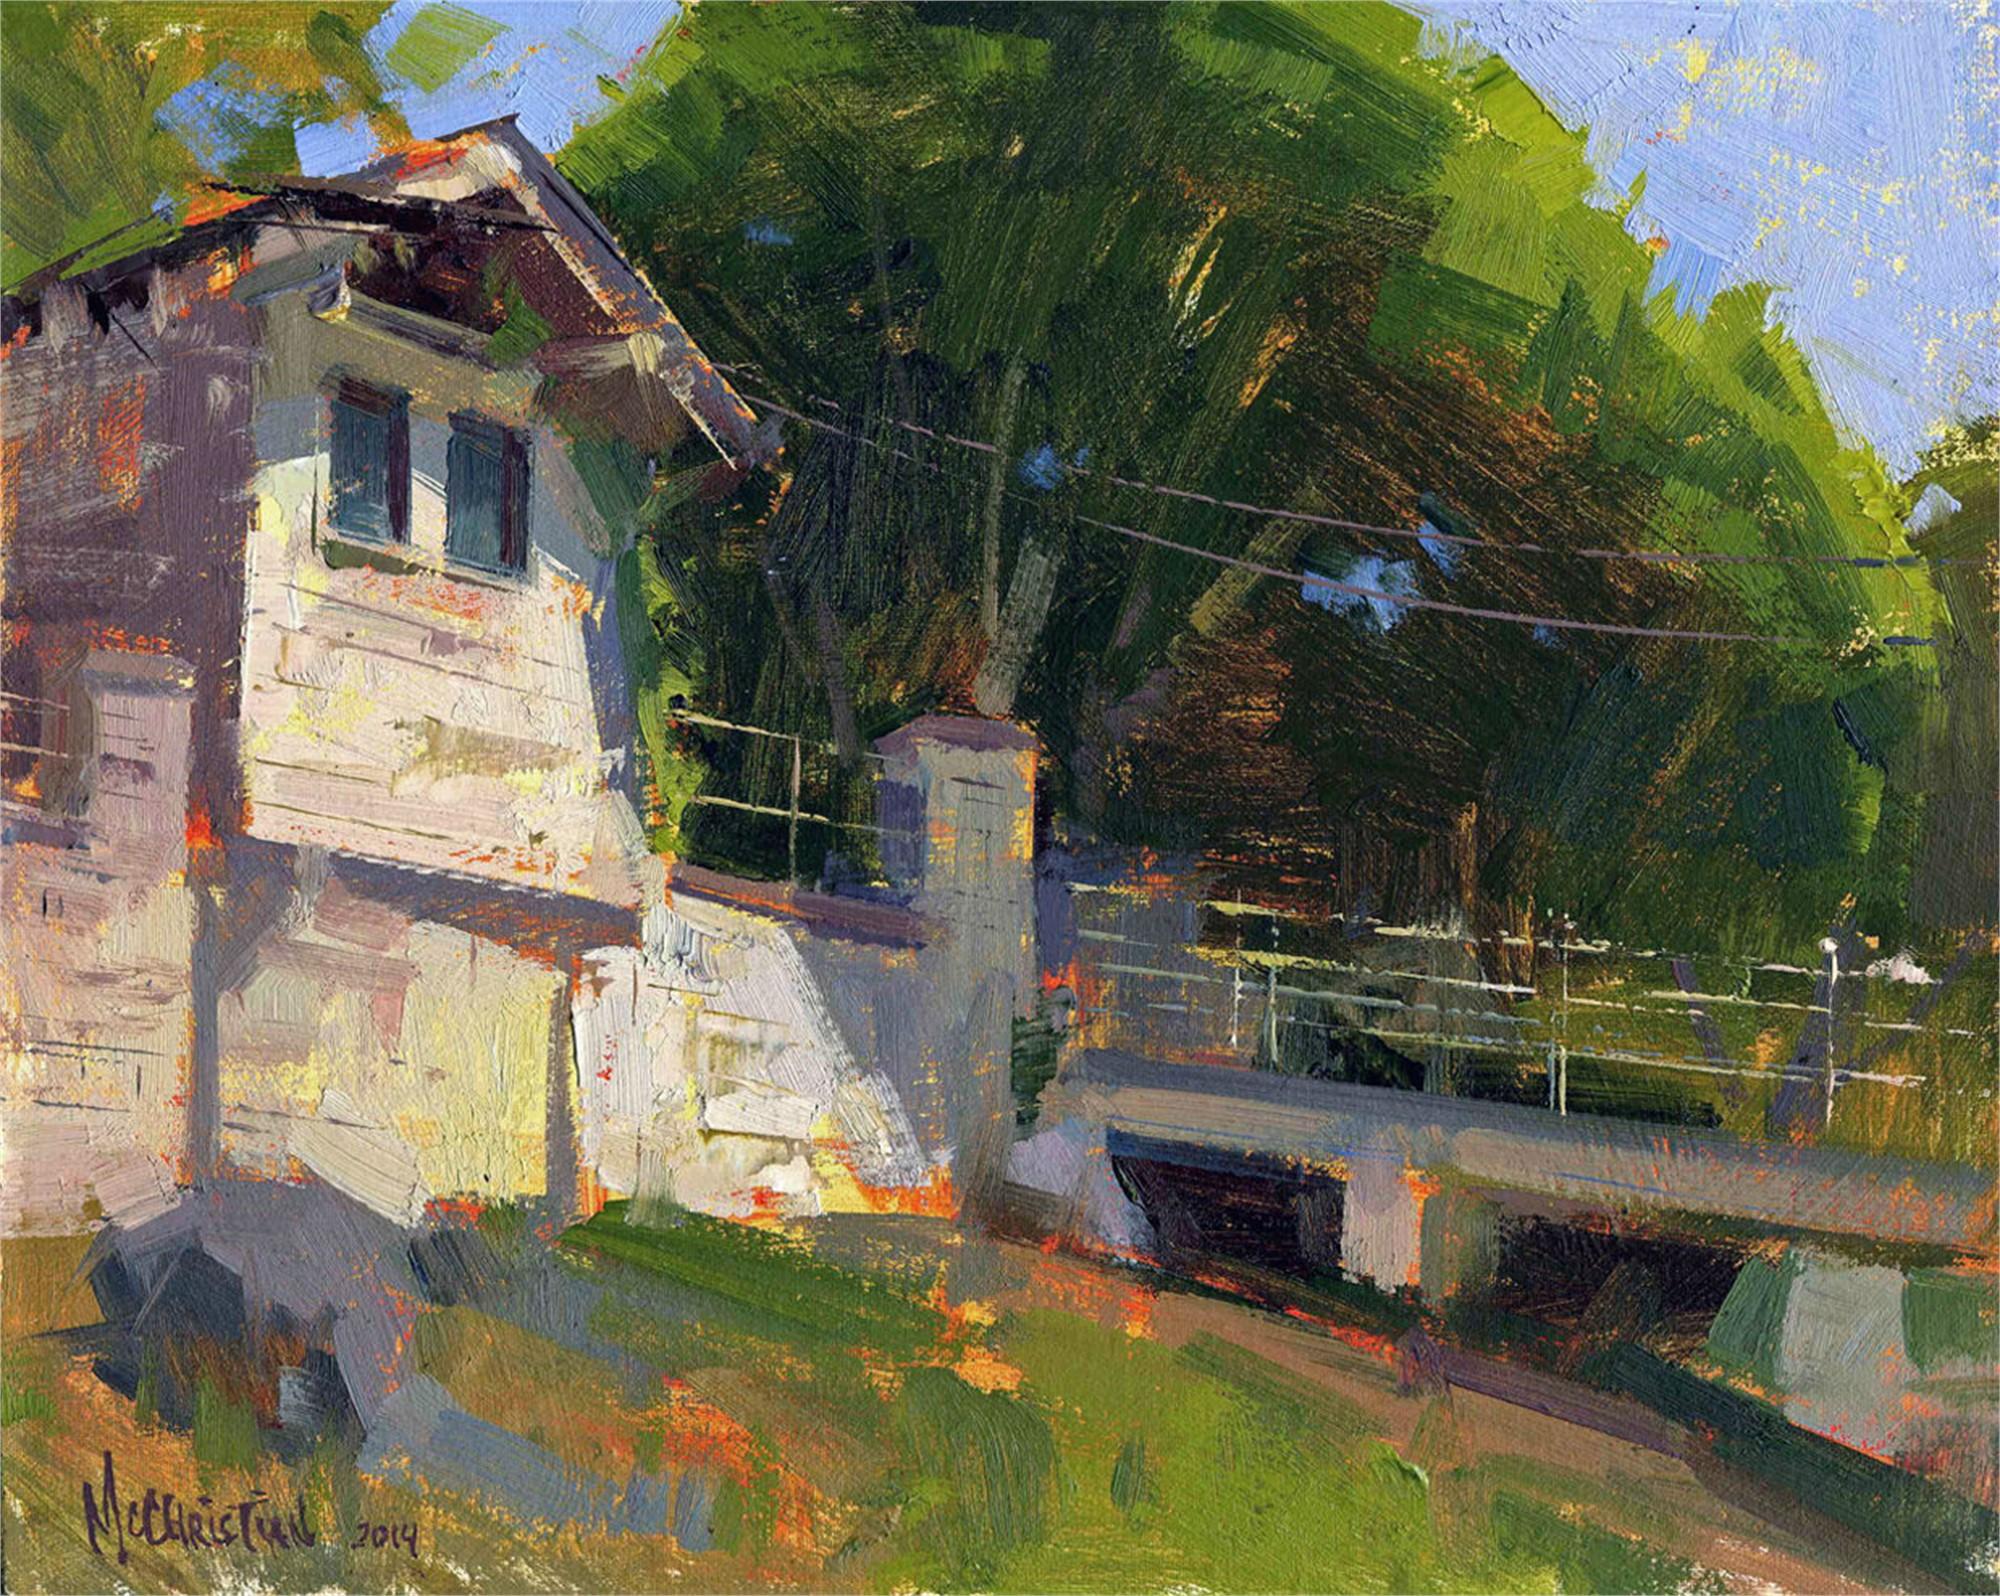 Barlow Bygone by Jennifer McChristian